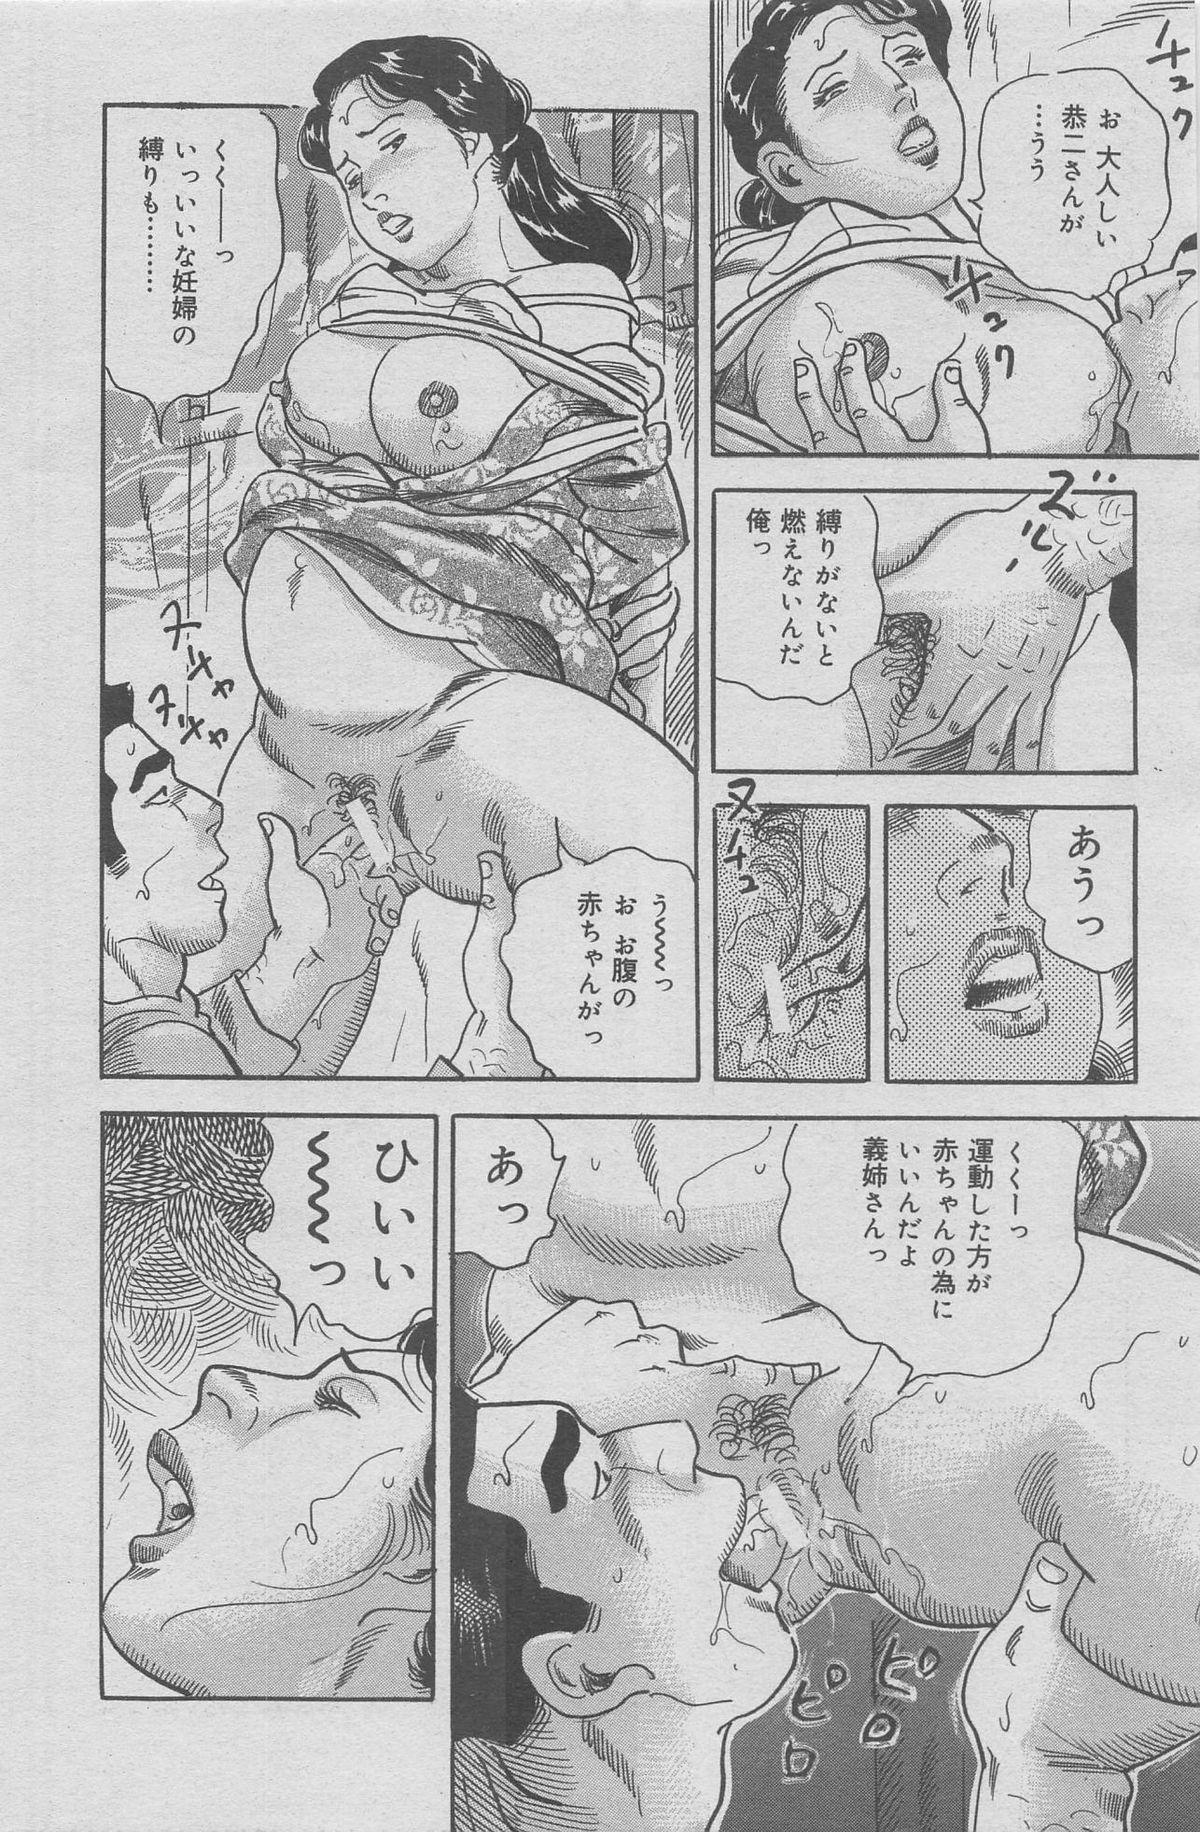 Hontou ni Atta Kindanai vol.7 89